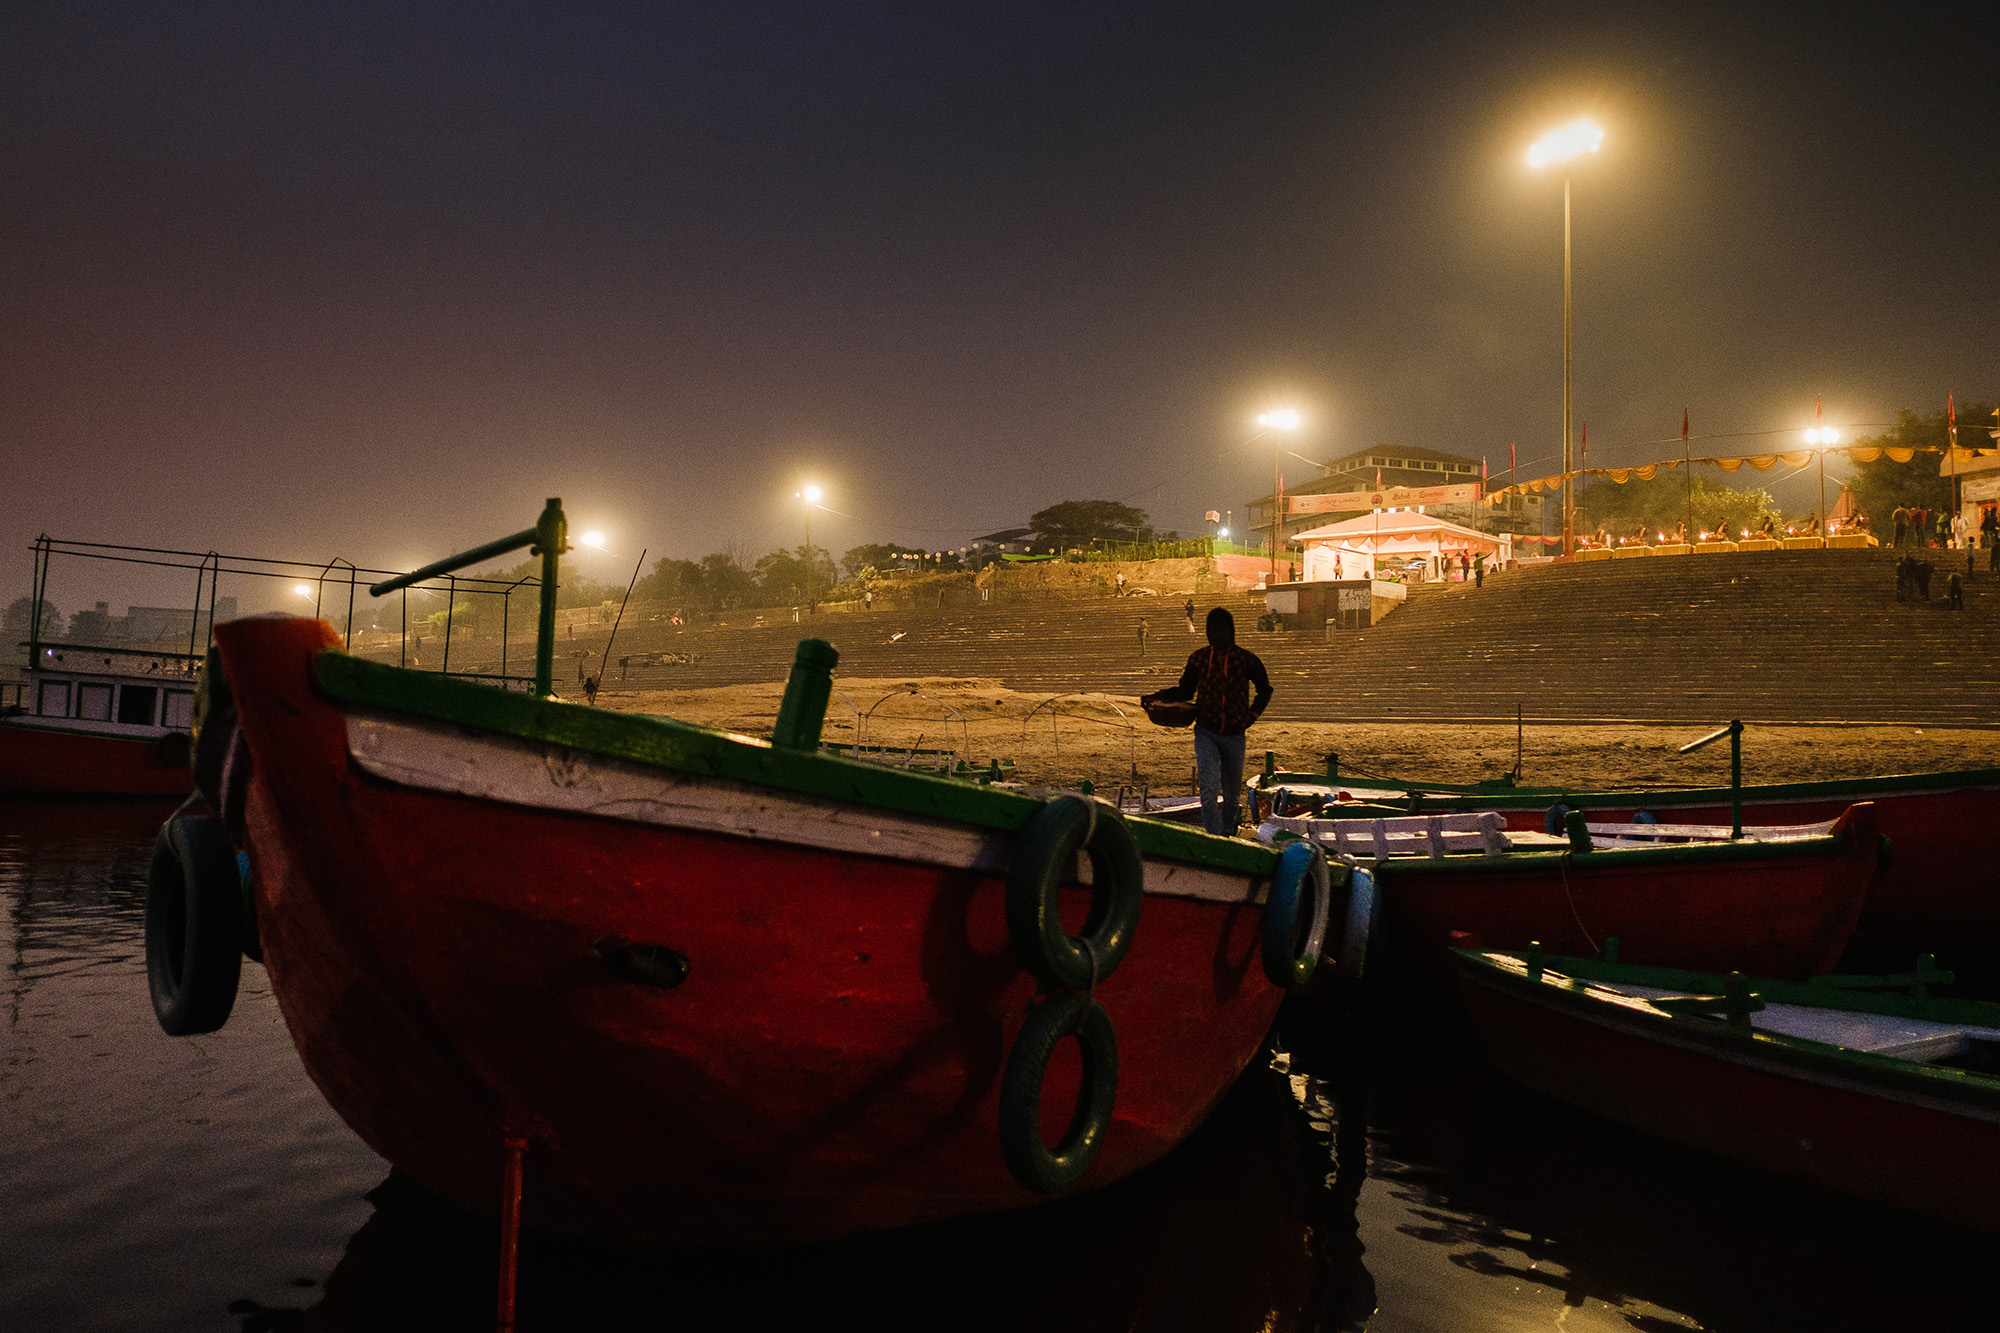 AnjaPoehlmann_India-Varanasi_109.jpg